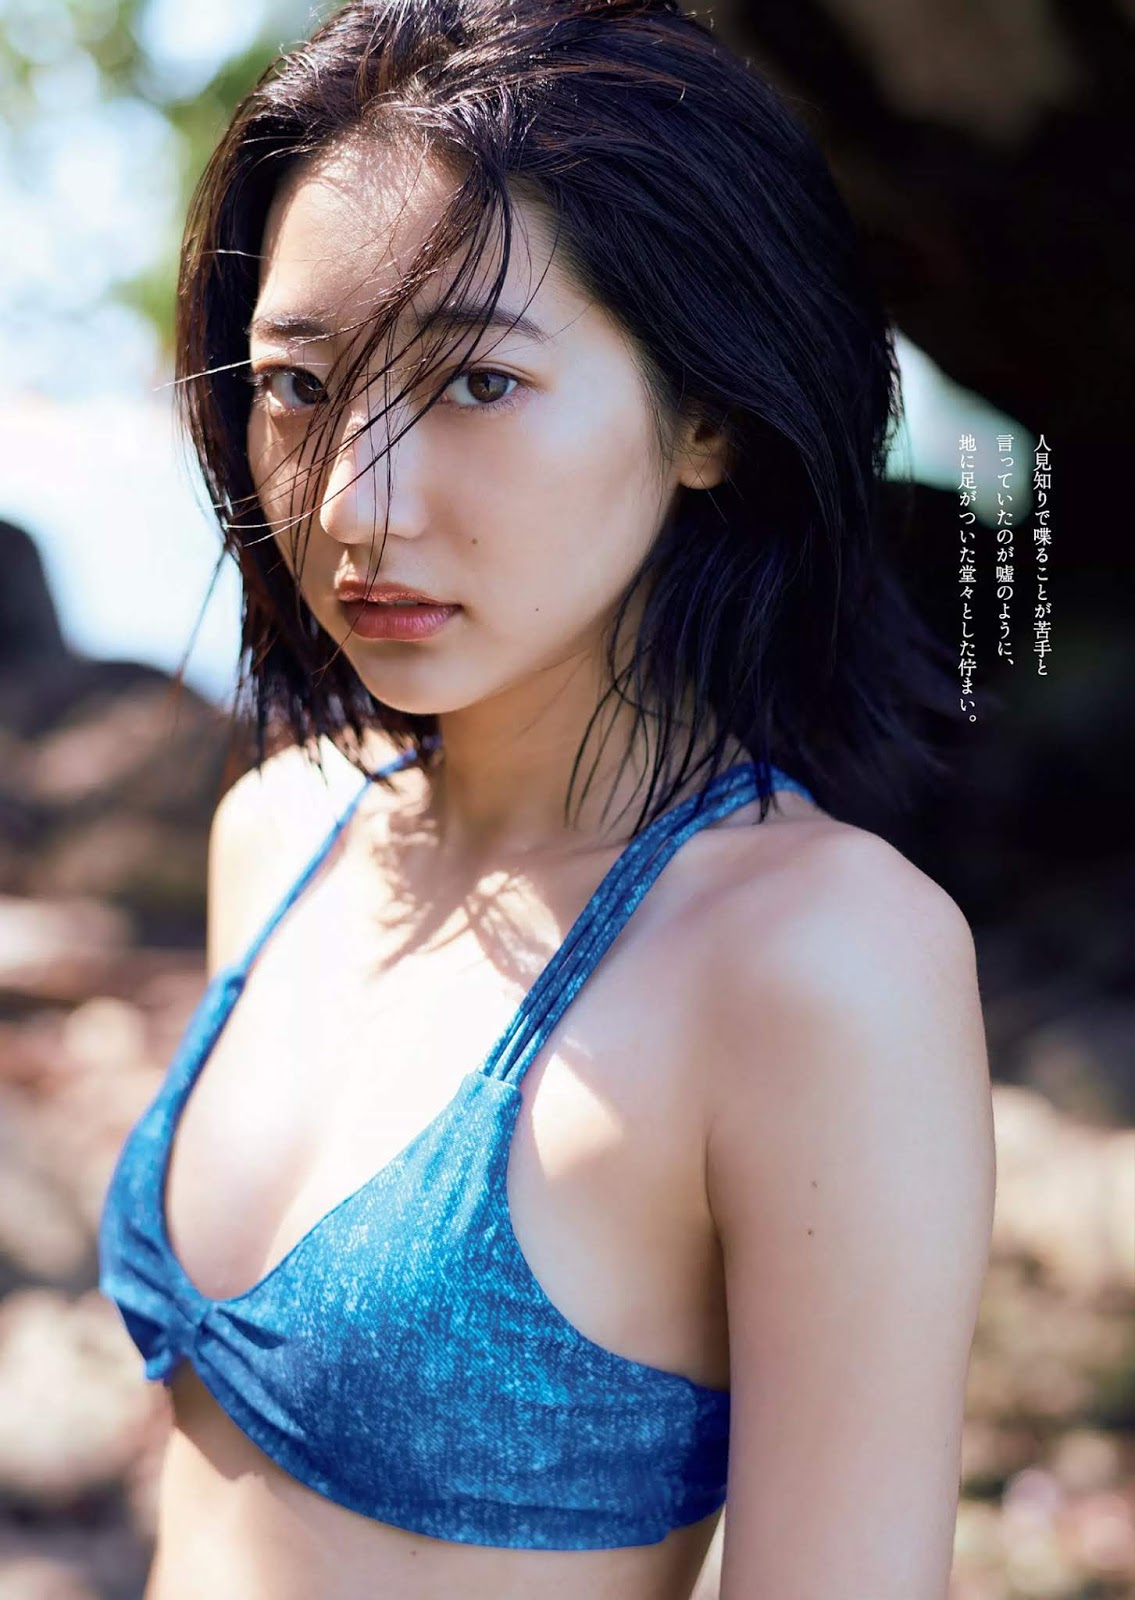 eyval.net: 武田玲奈. Rena Takeda. たけだ れな - Weekly Playboy / 2018.04.09